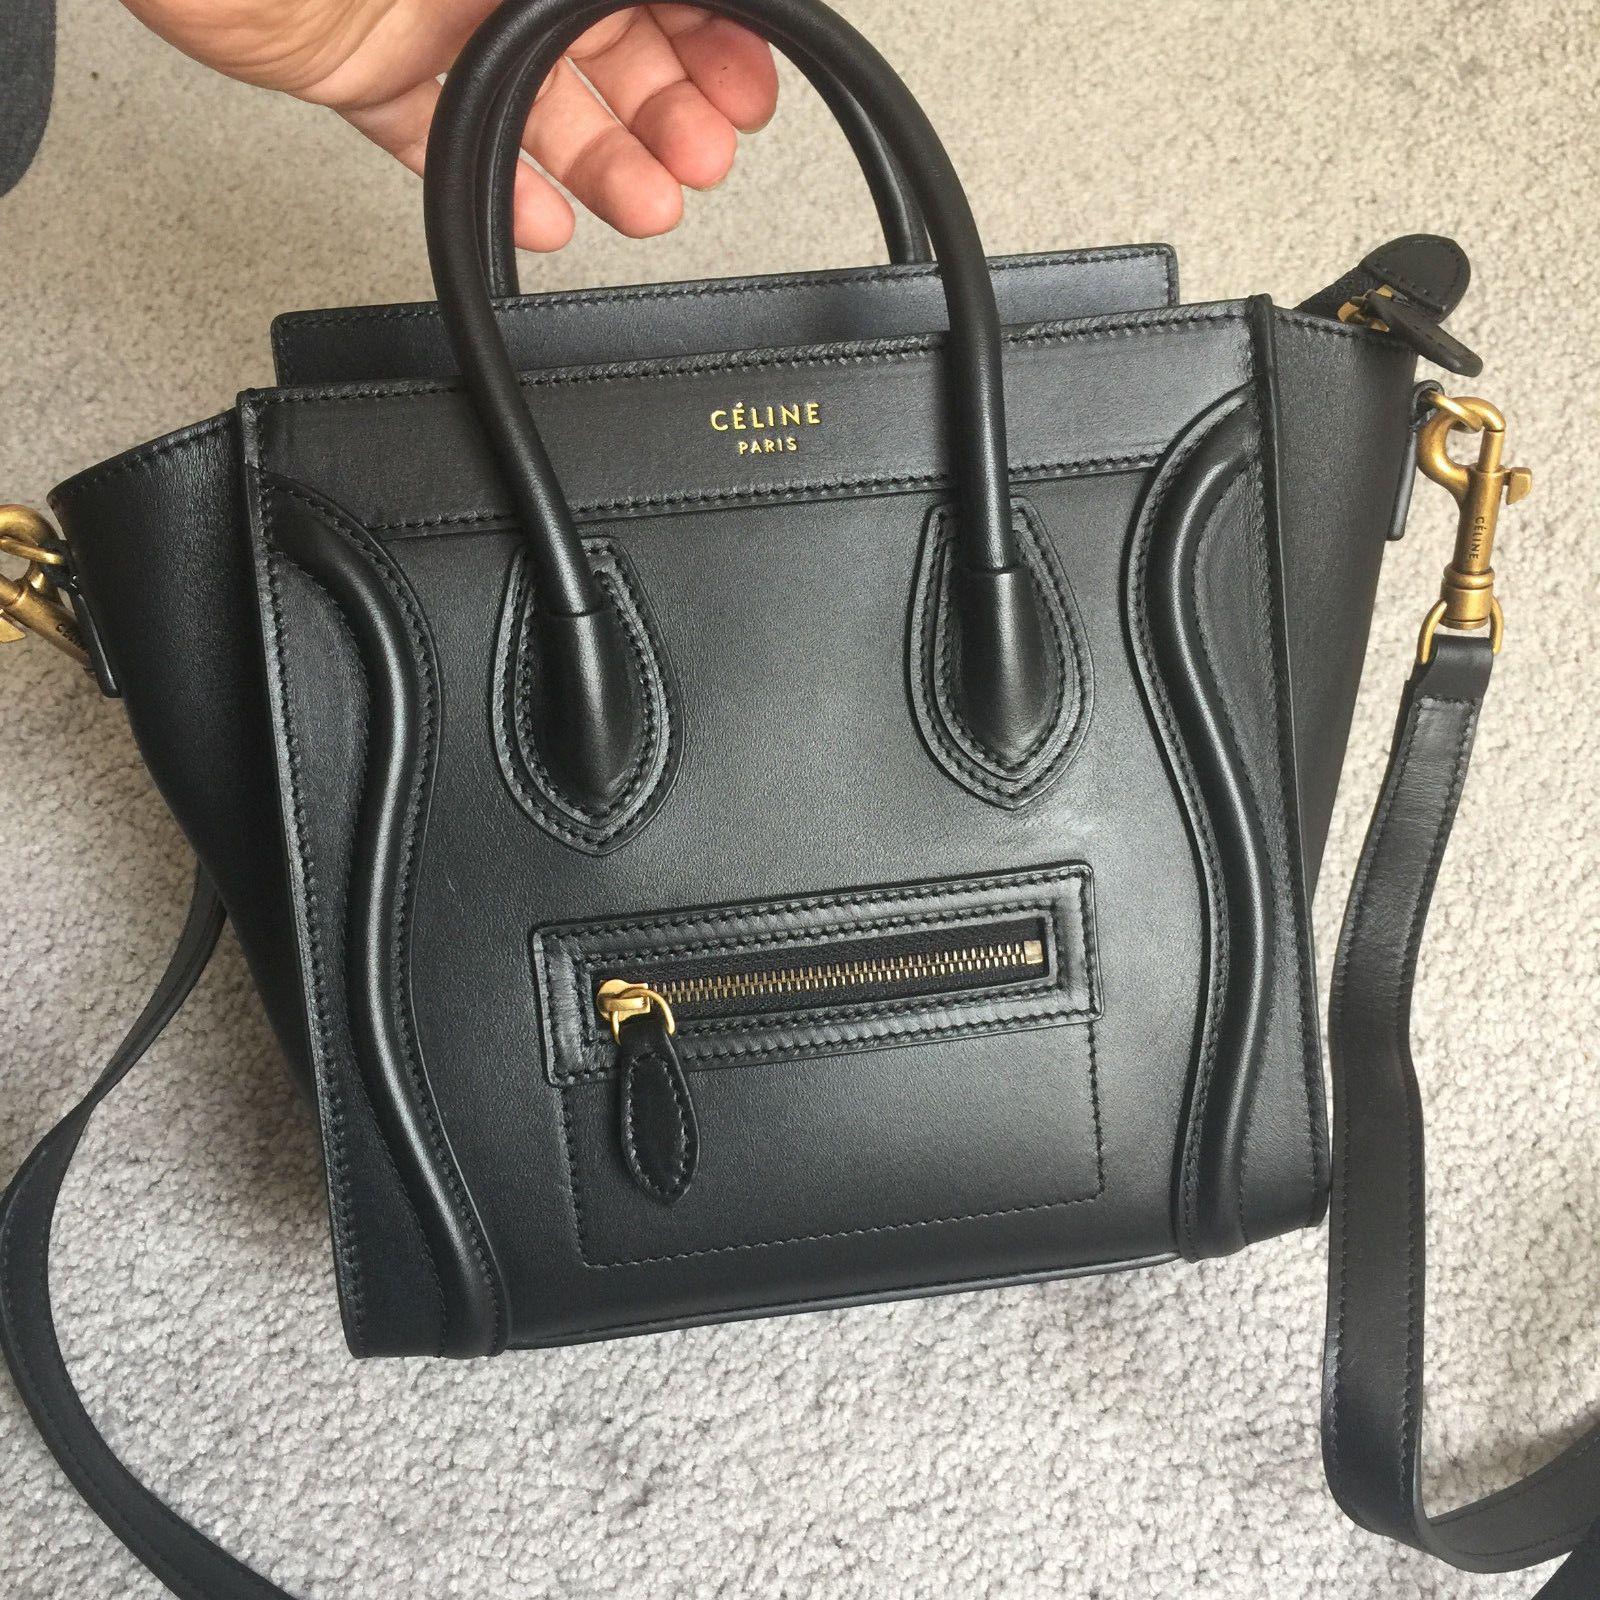 b0a91d09e7338 AUTH CELINE Calfskin Nano Luggage black mini bag | Celine in 2019 ...